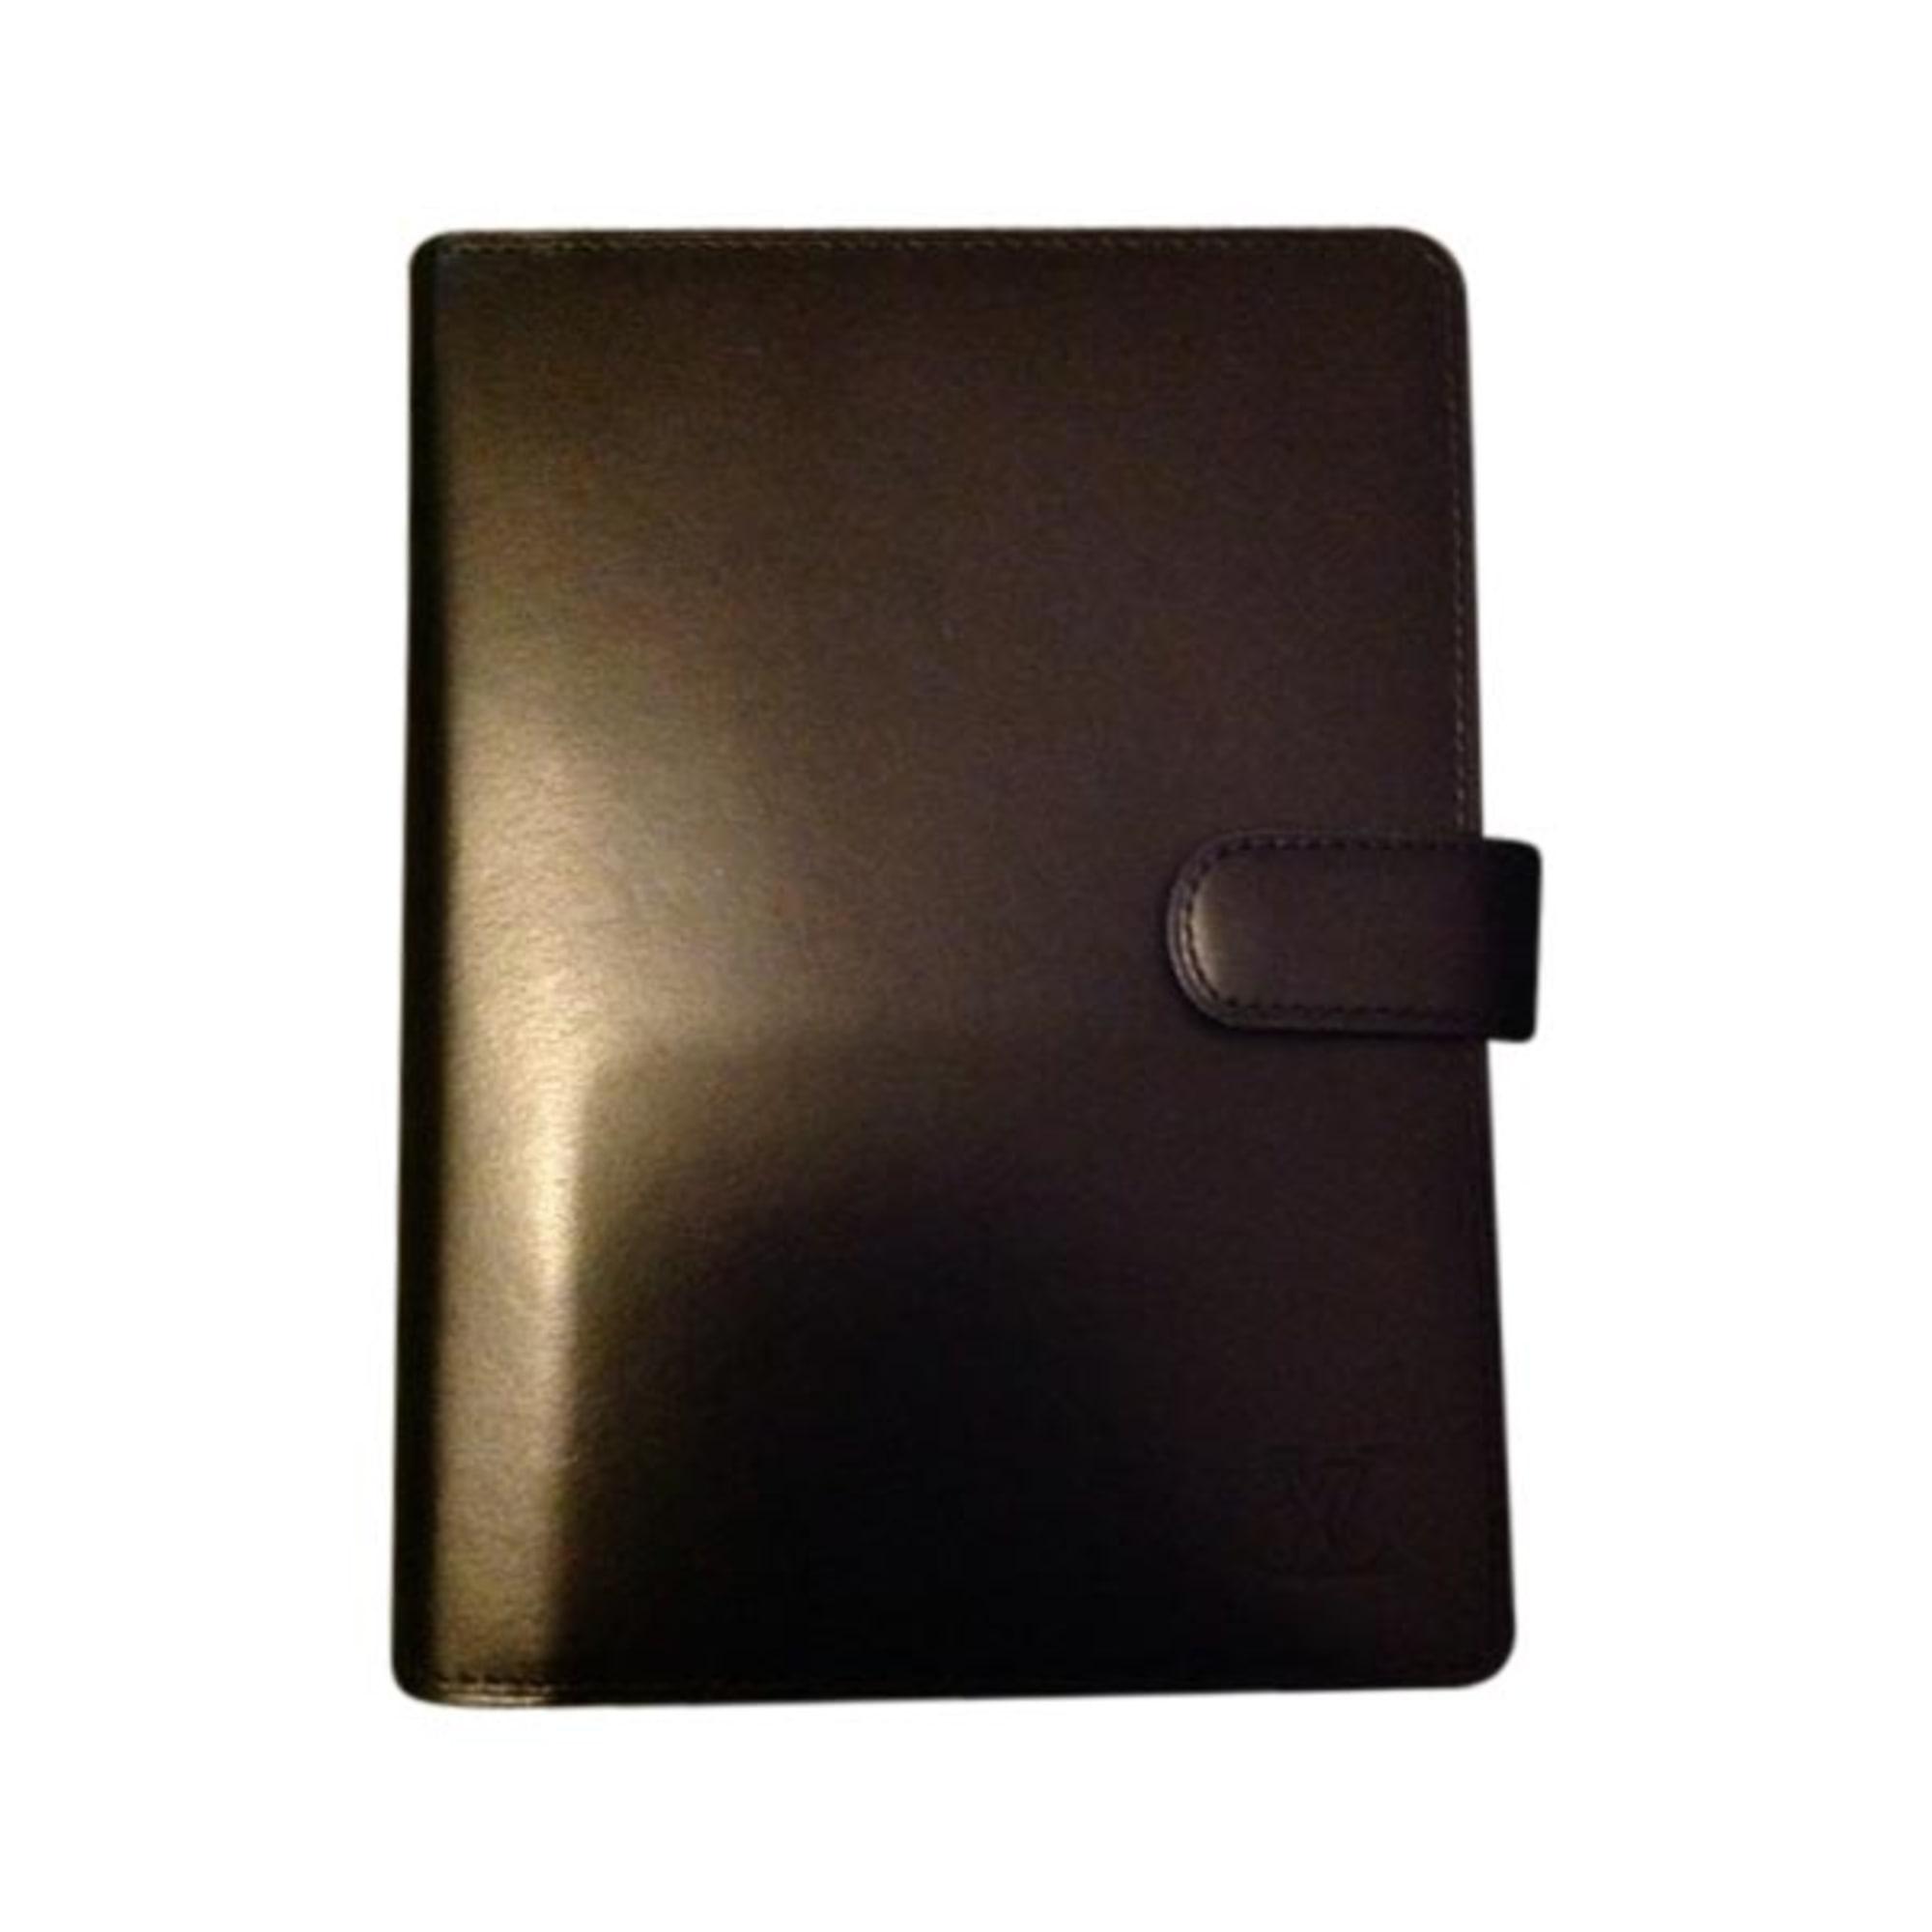 Porte-cartes LOUIS VUITTON Noir